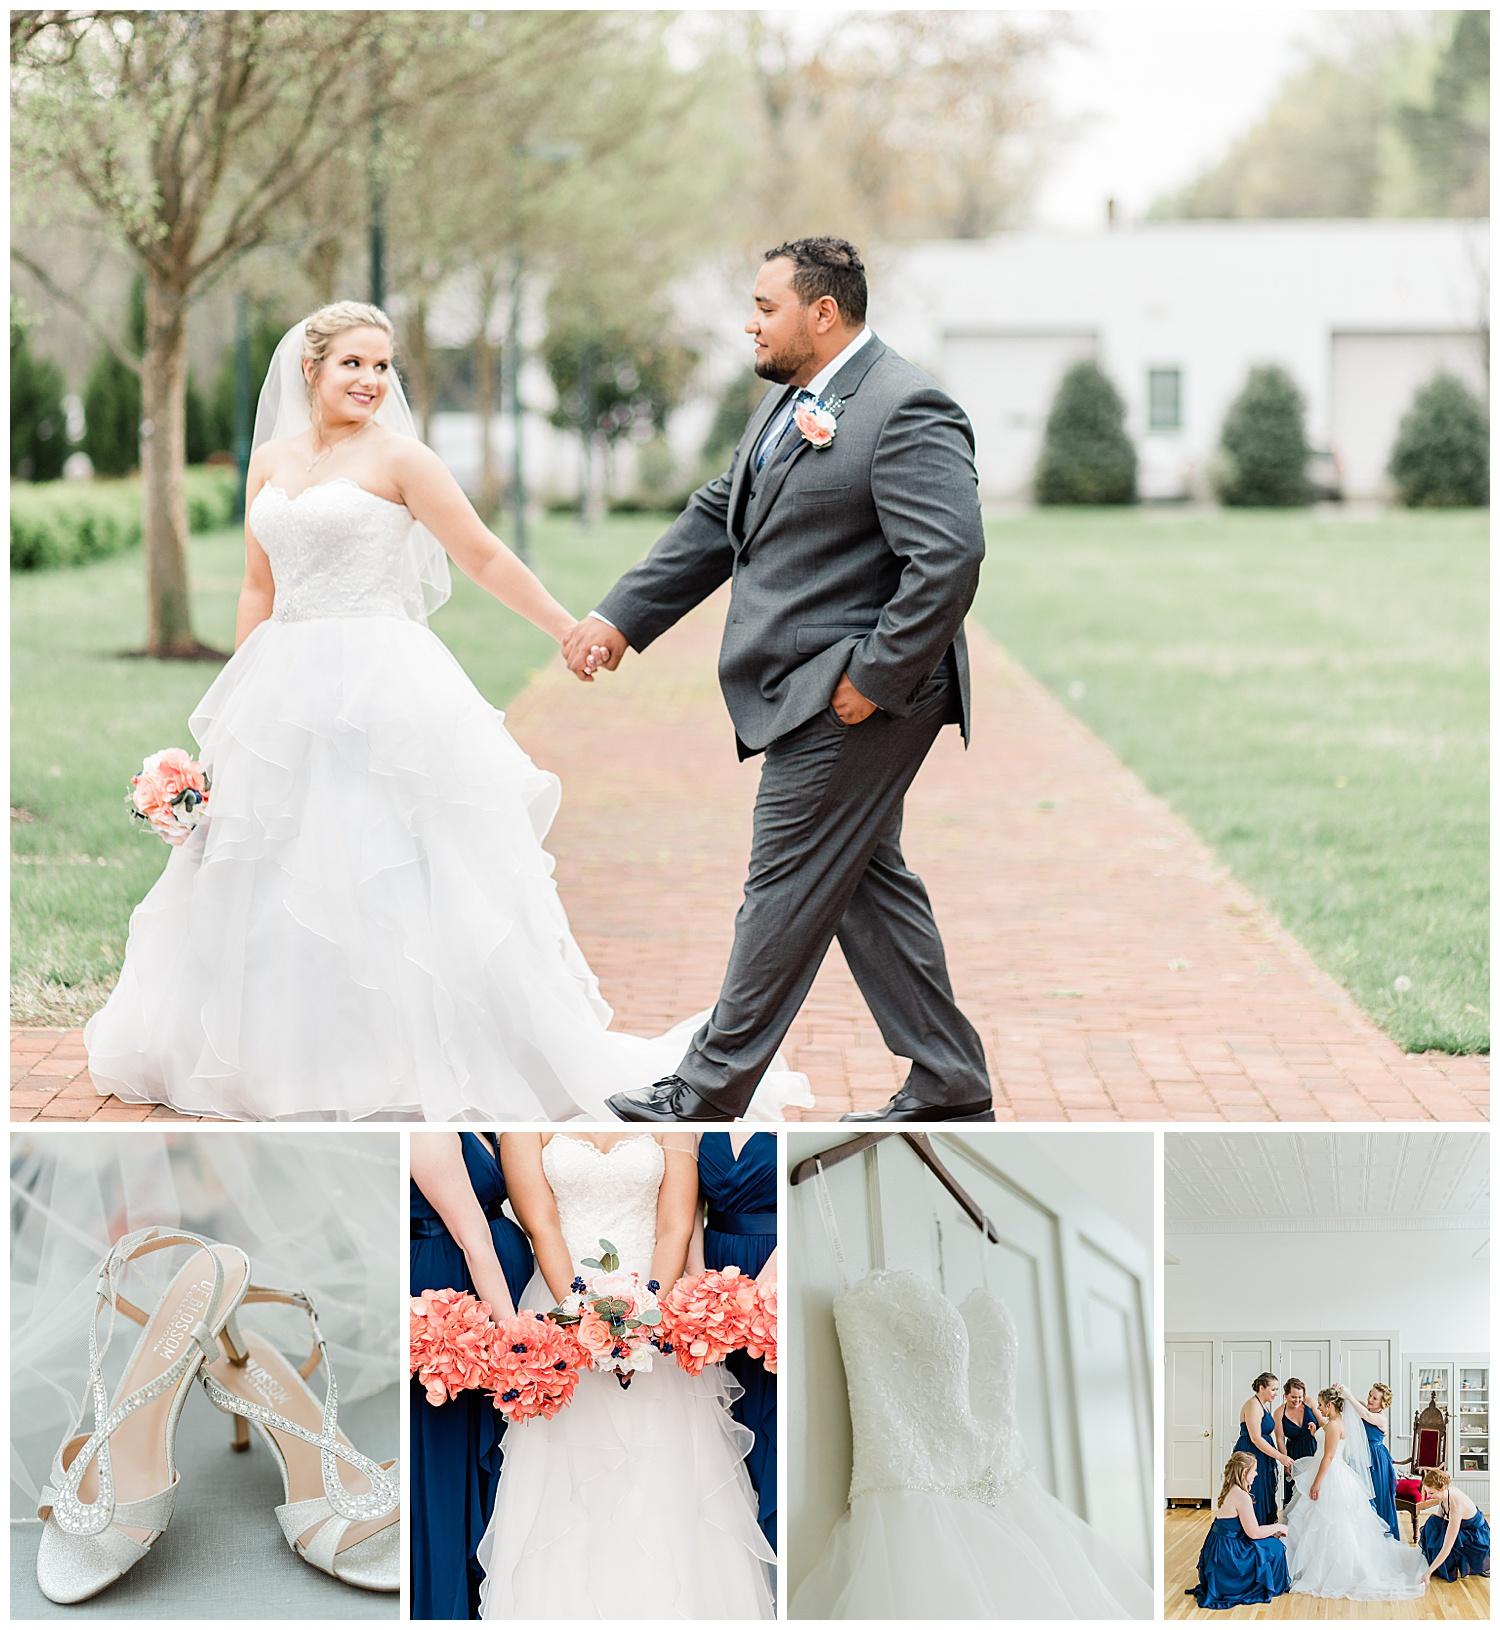 Montpelier Center for the Arts Wedding - Virginia Wedding Photographers